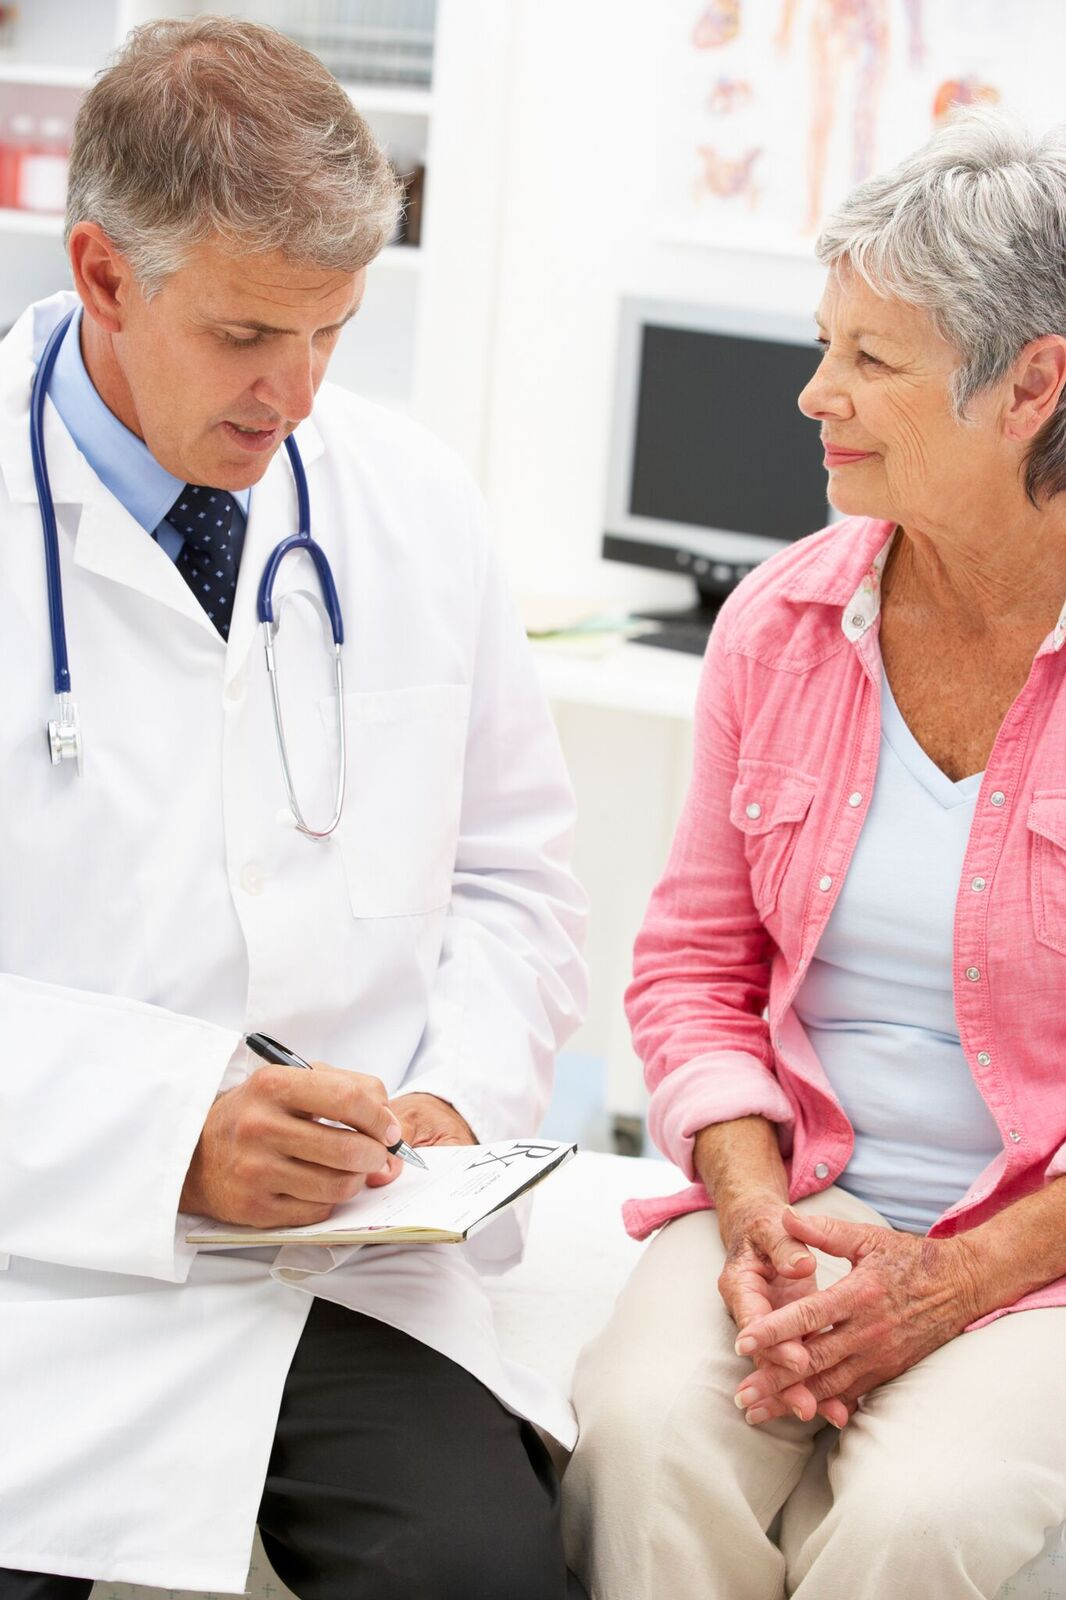 Sex hormones and rheumatoid arthritis